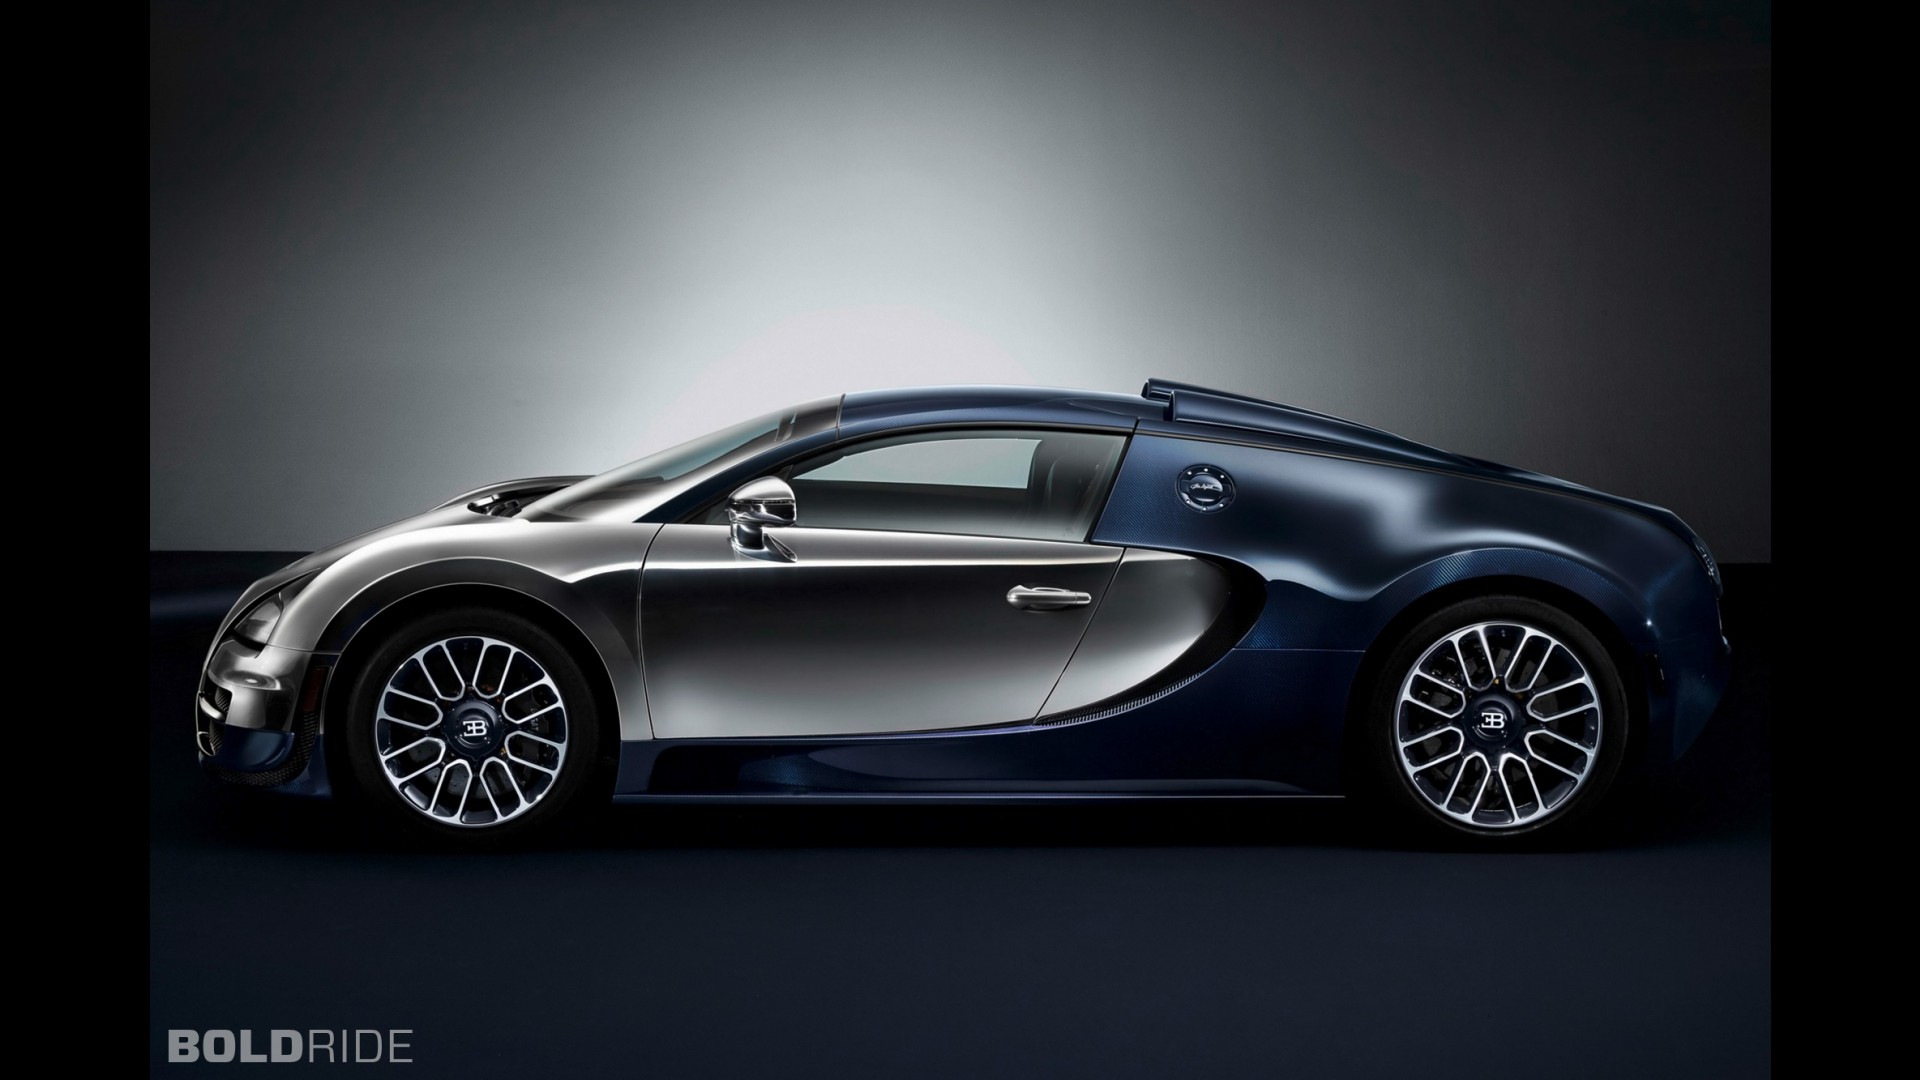 bugatti-veyron-grand-sport-vitesse-legend-ettore-bugatti Fascinating Bugatti Veyron Grand Sport Vitesse Convertible Cars Trend